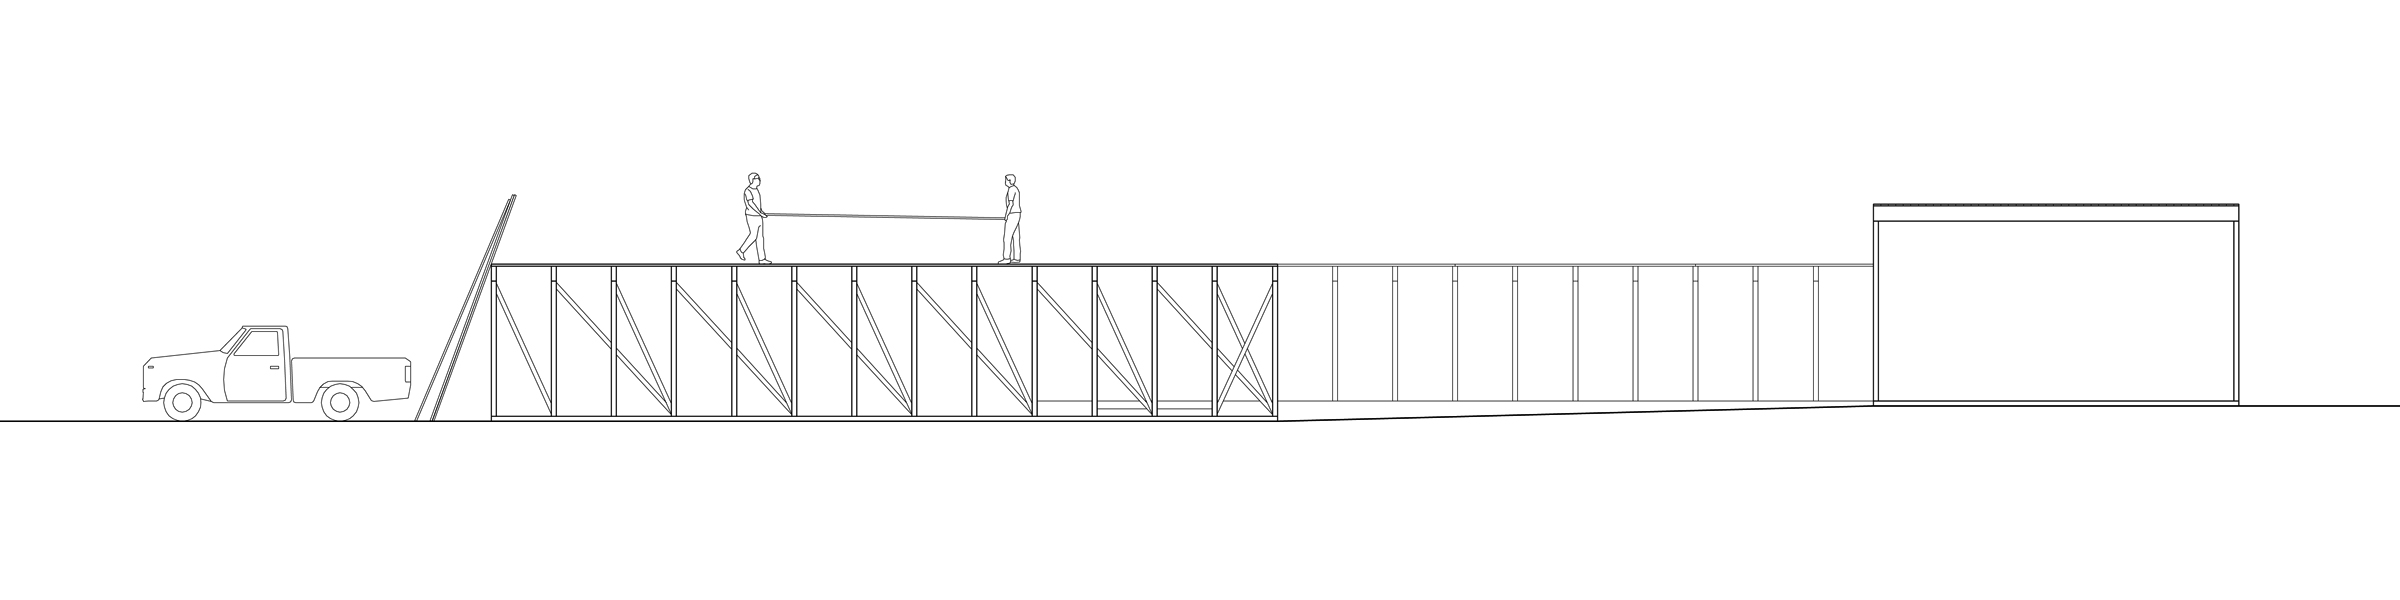 East Amazon Studio. East elevation, under construction